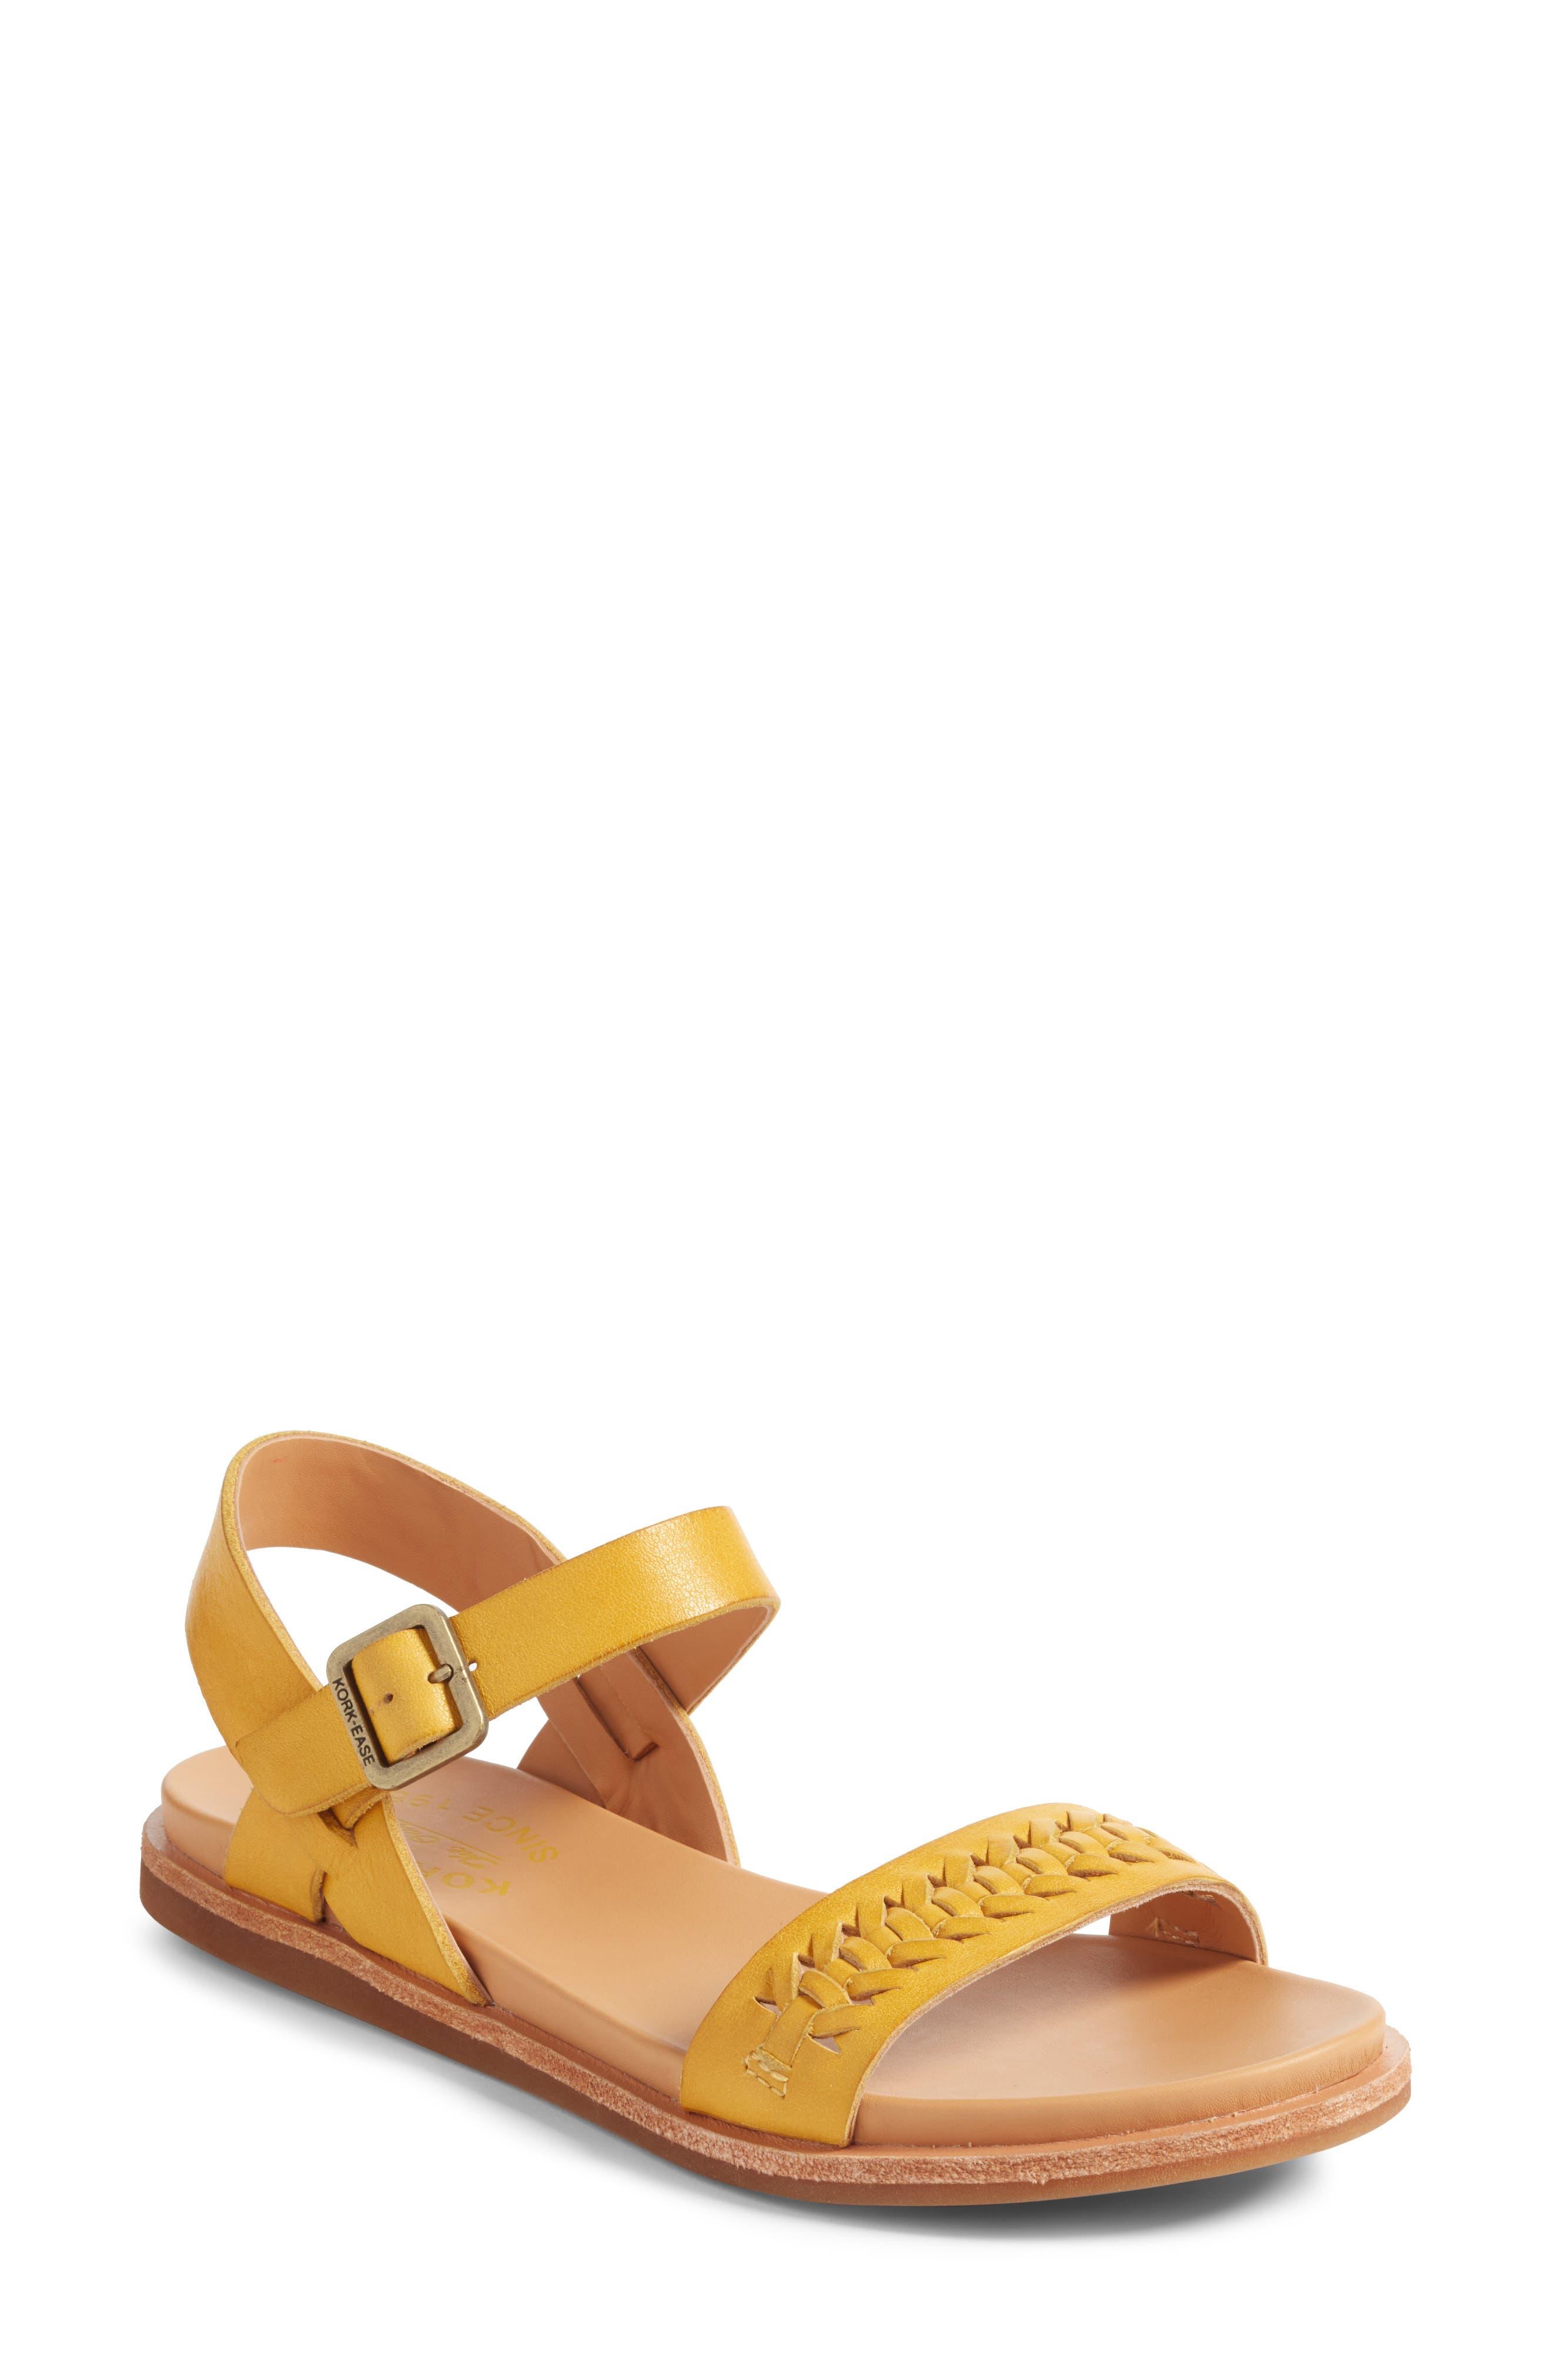 Yucca Braid Sandal,                             Main thumbnail 1, color,                             Yellow Leather